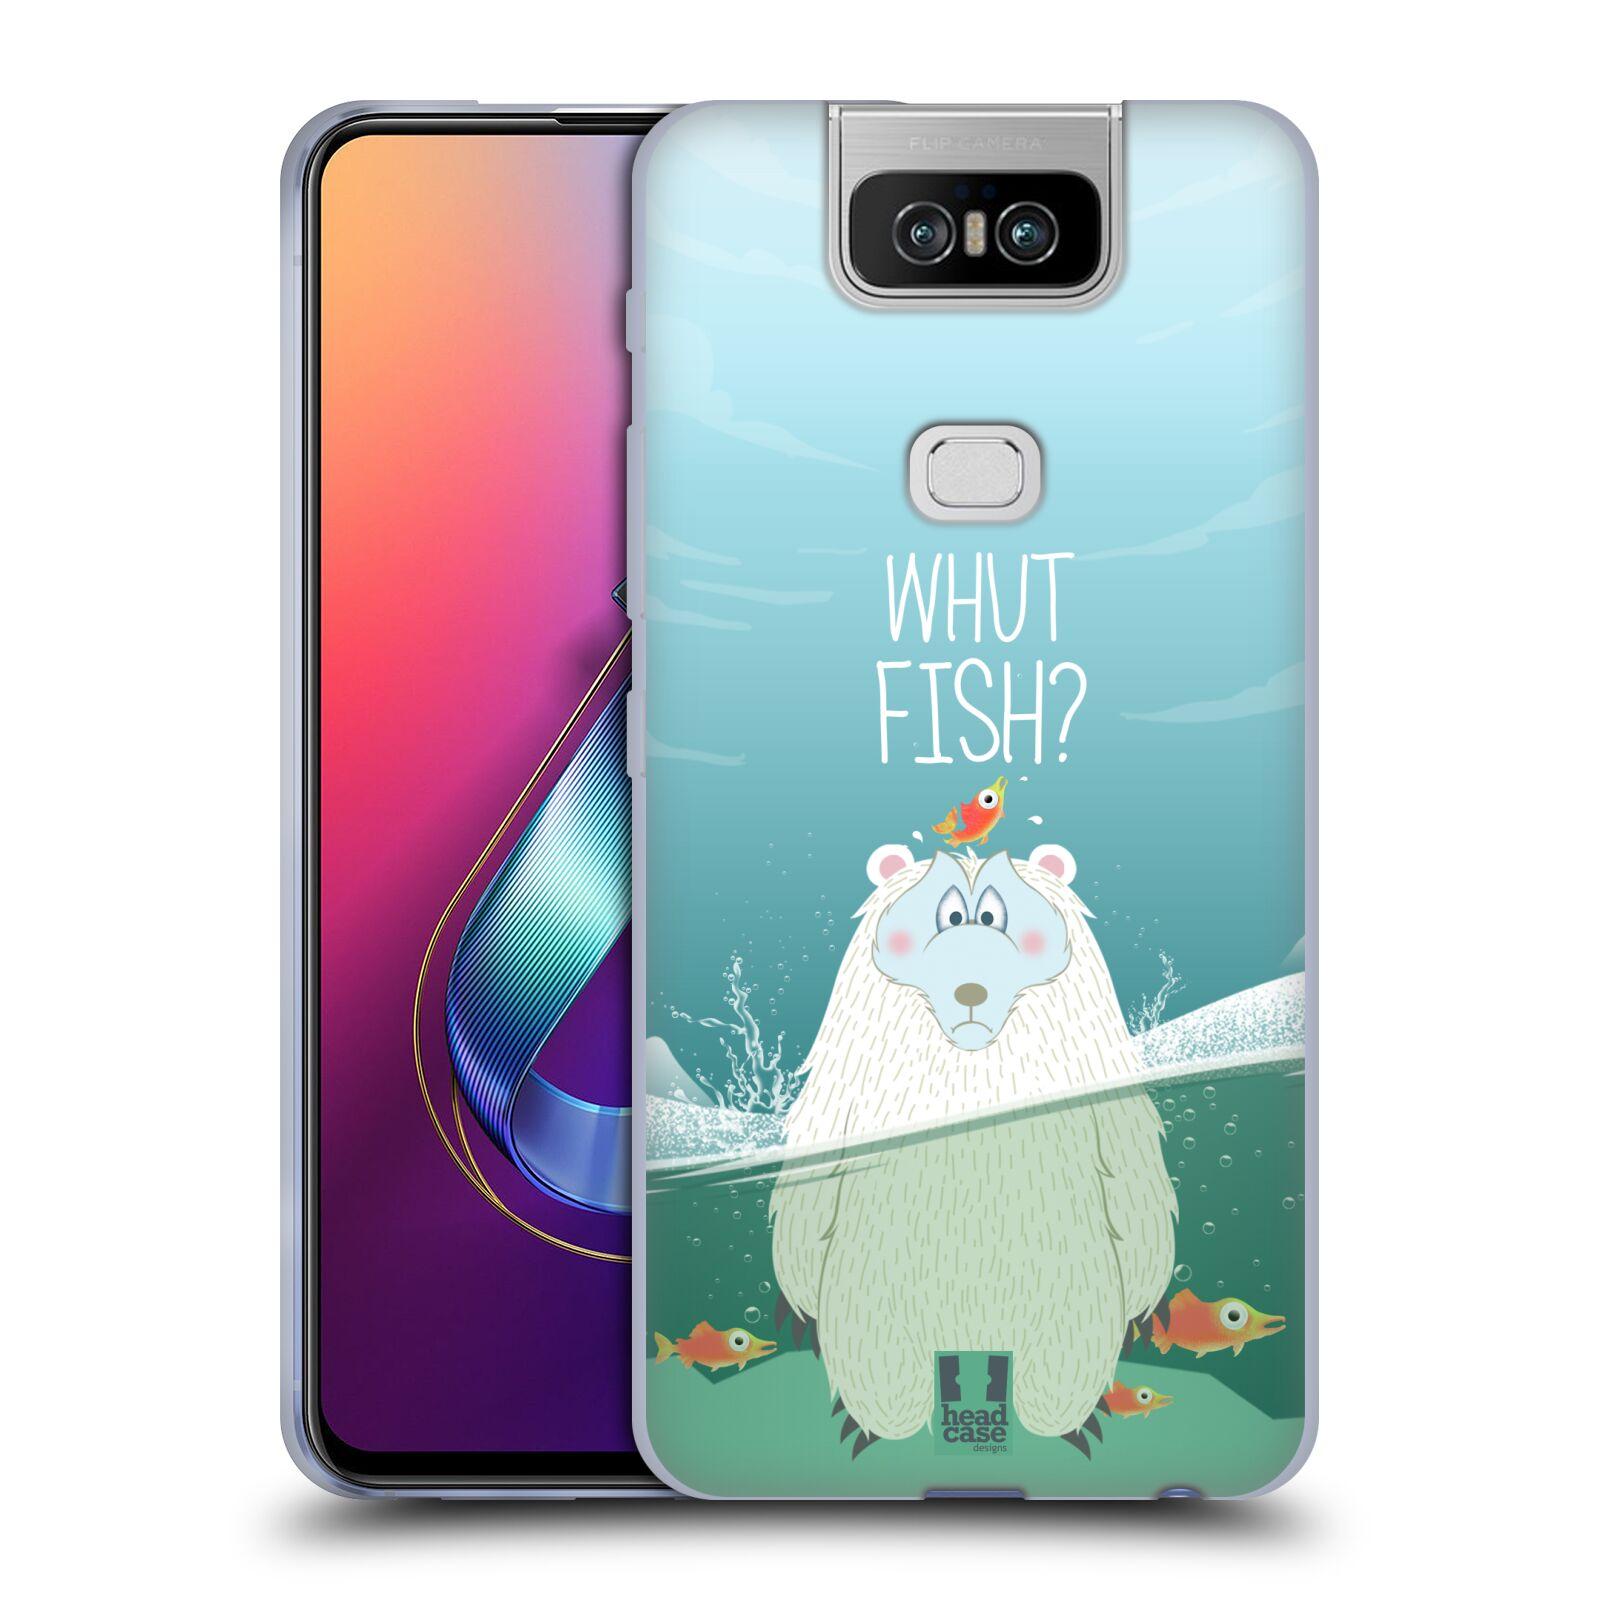 Silikonové pouzdro na mobil Asus Zenfone 6 ZS630KL - Head Case - Medvěd Whut Fish?